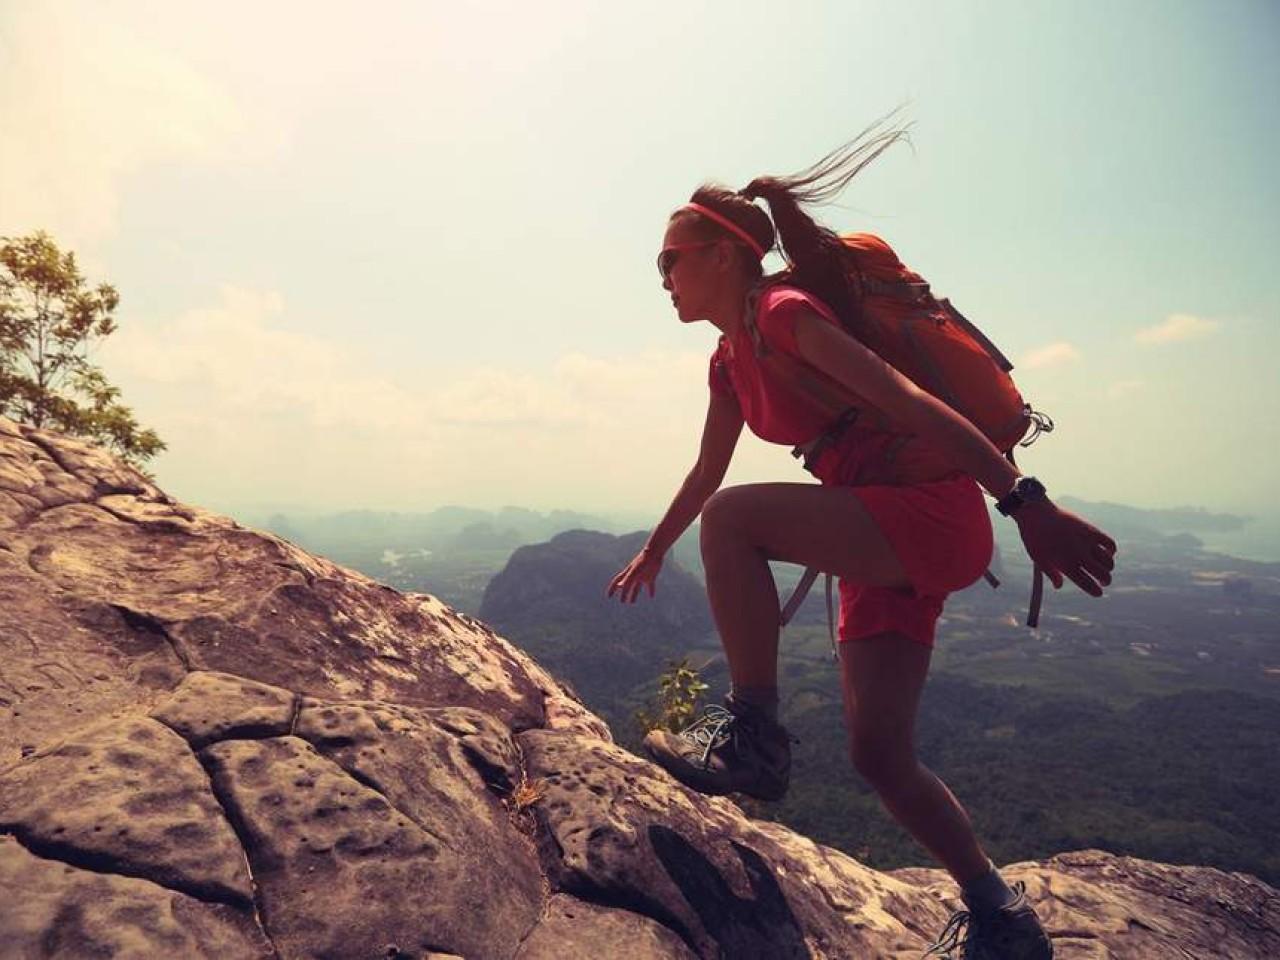 Unique Hiking experience in Kassandra – Halkidiki